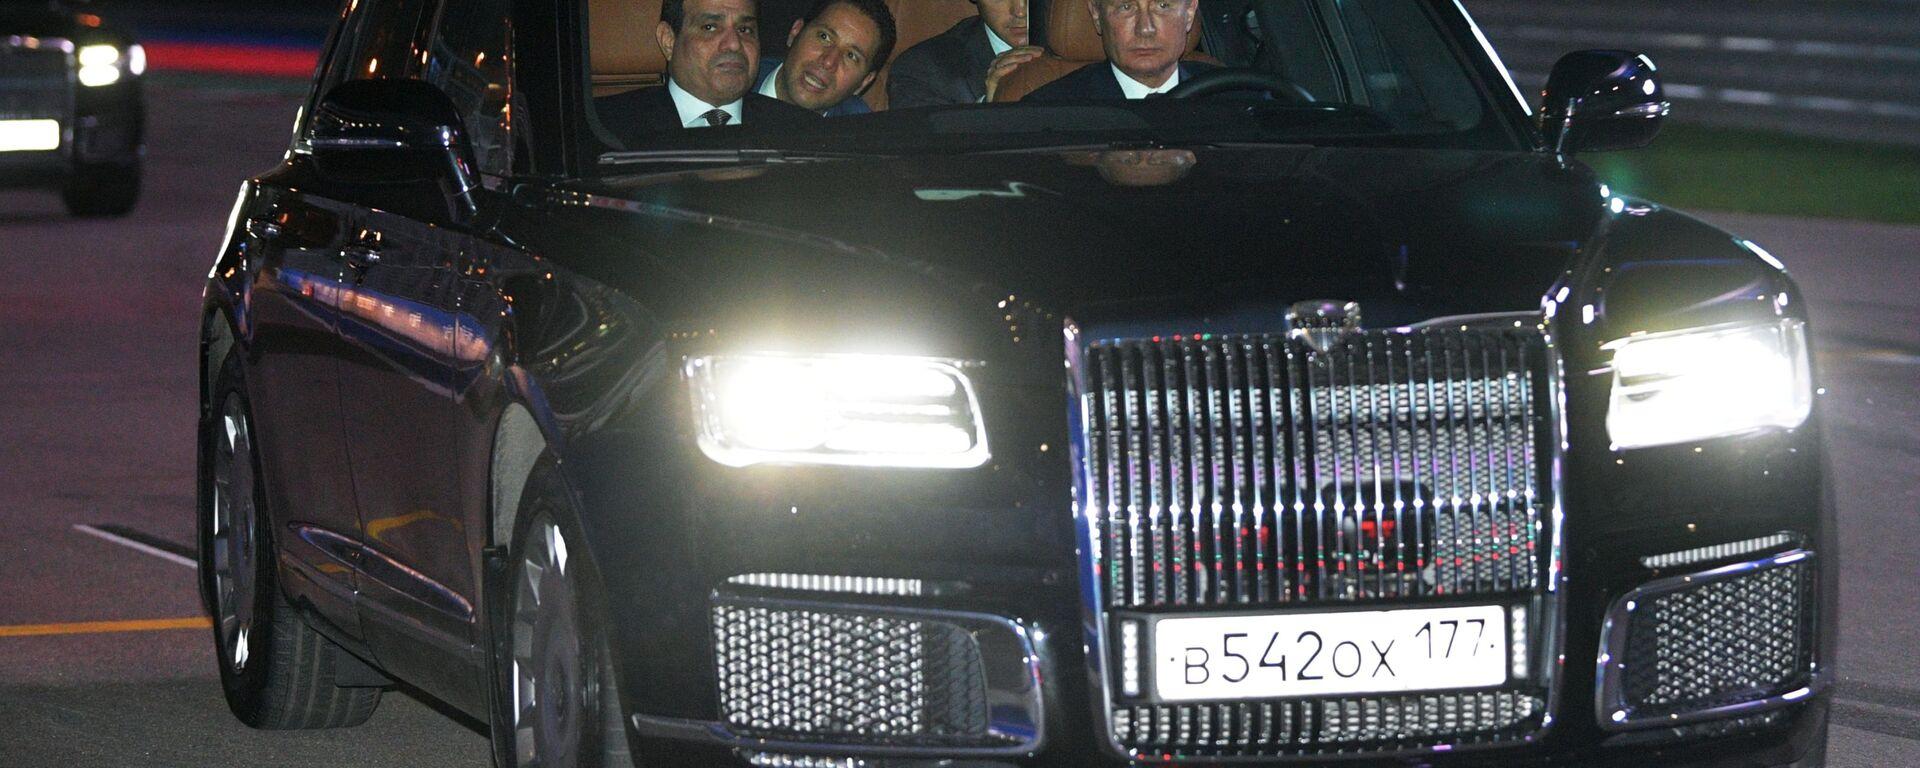 Ruský prezident Vladimir Putin a prezident Egyptské arabské republiky Abdel Fattah al-Sisi v autě Aurus - Sputnik Česká republika, 1920, 04.06.2021